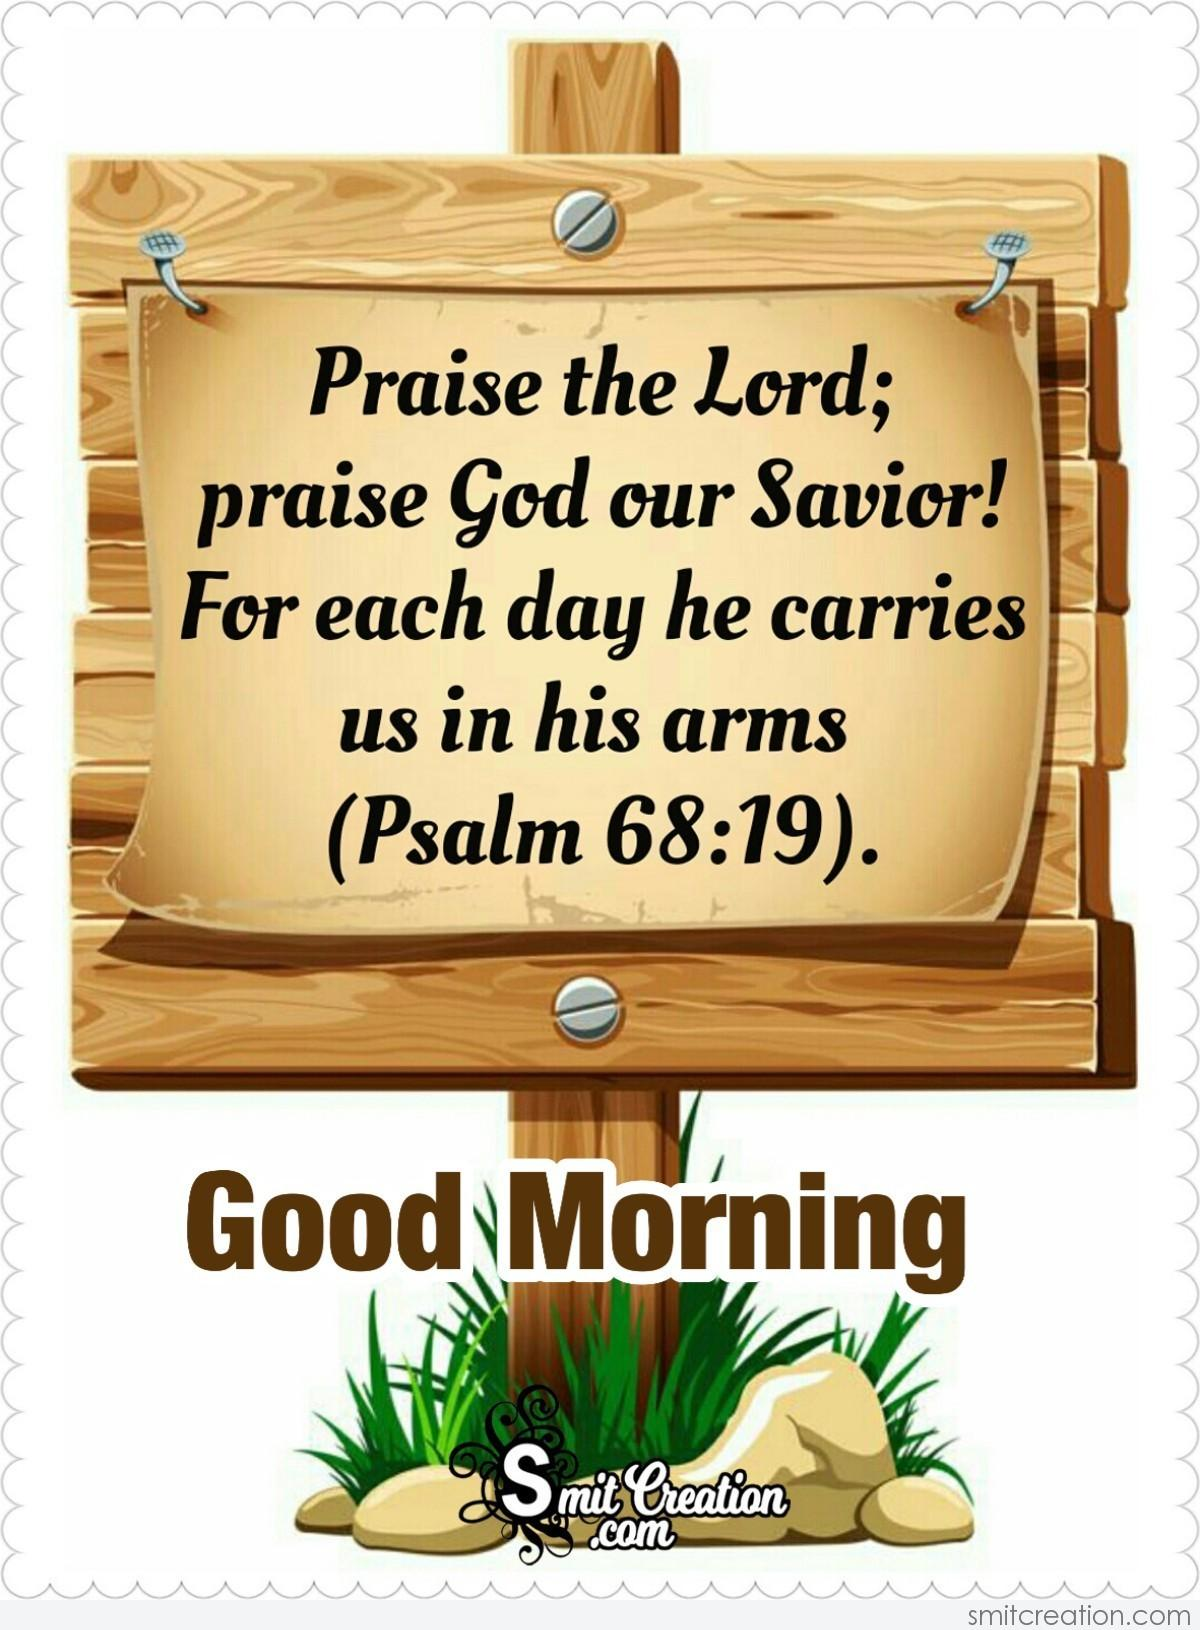 Good Morning Praise The Lord - SmitCreation.com